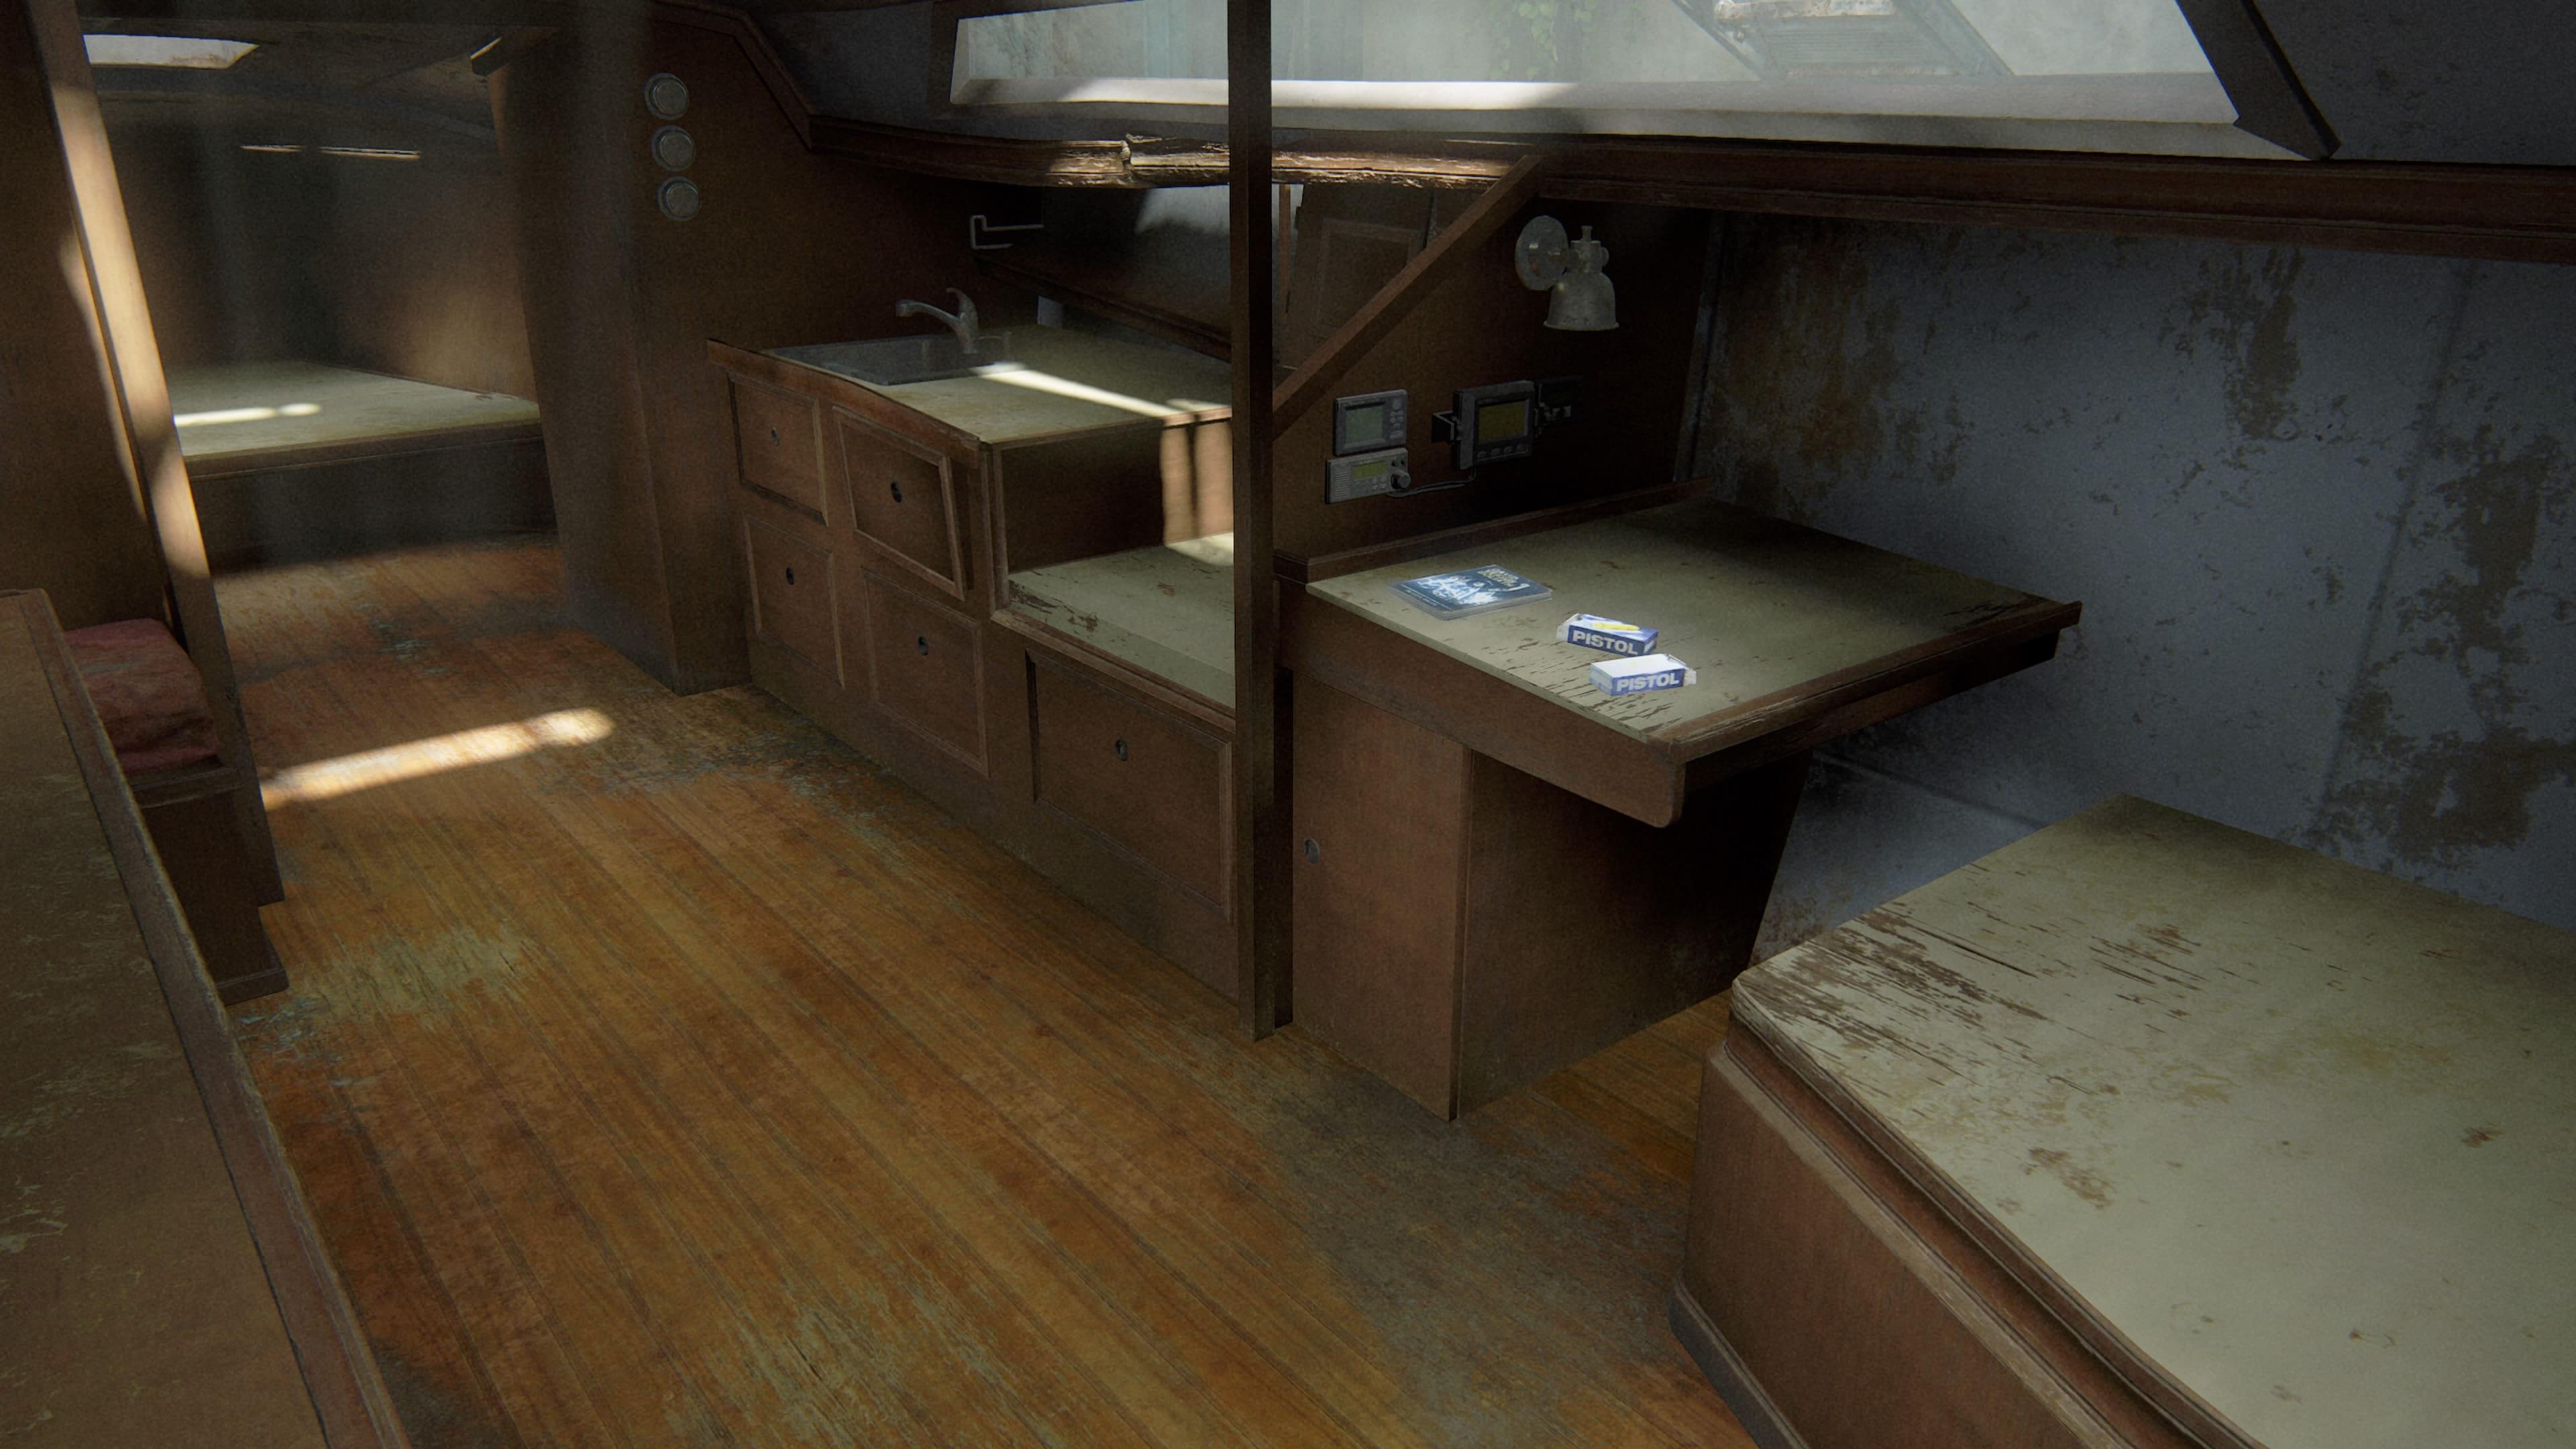 The Last of Us 2 Boot Trainingsbuch Verdeckte Operationen